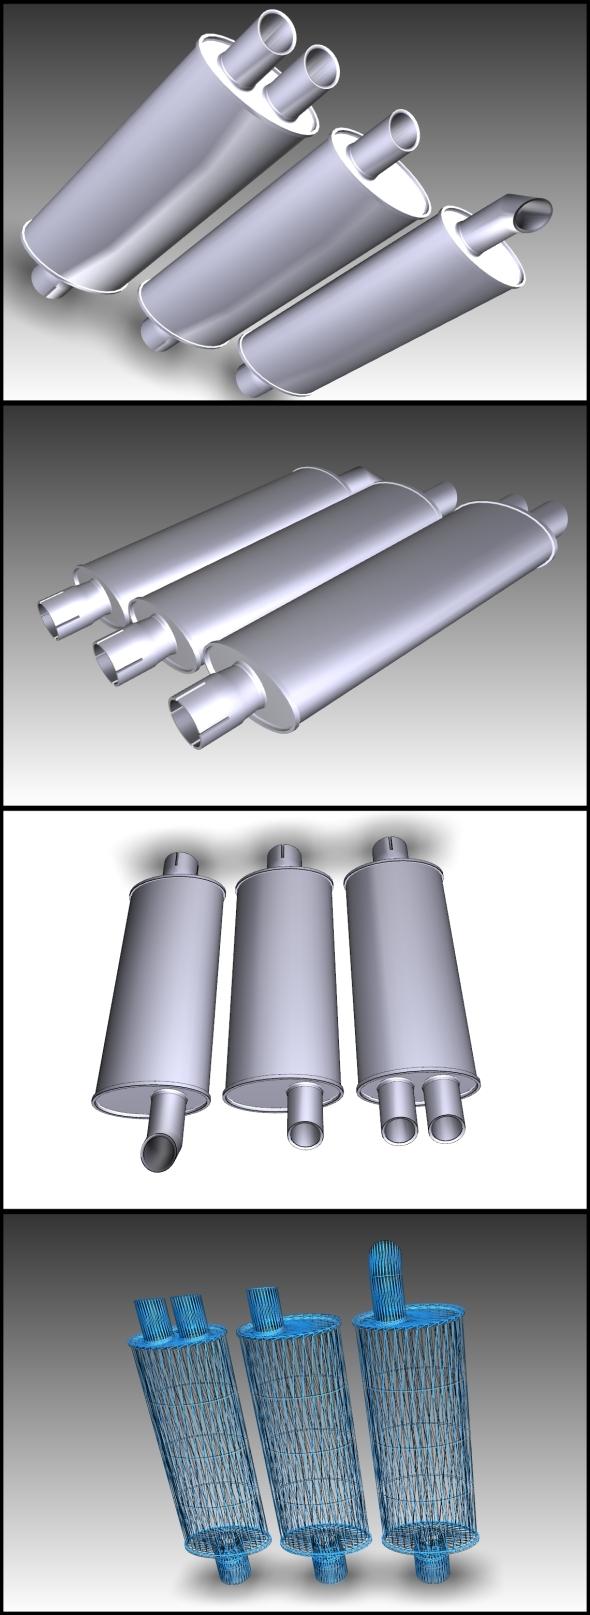 3 in 1 Exhaust pipe (Turbo+Sport+Standart) - 3DOcean Item for Sale